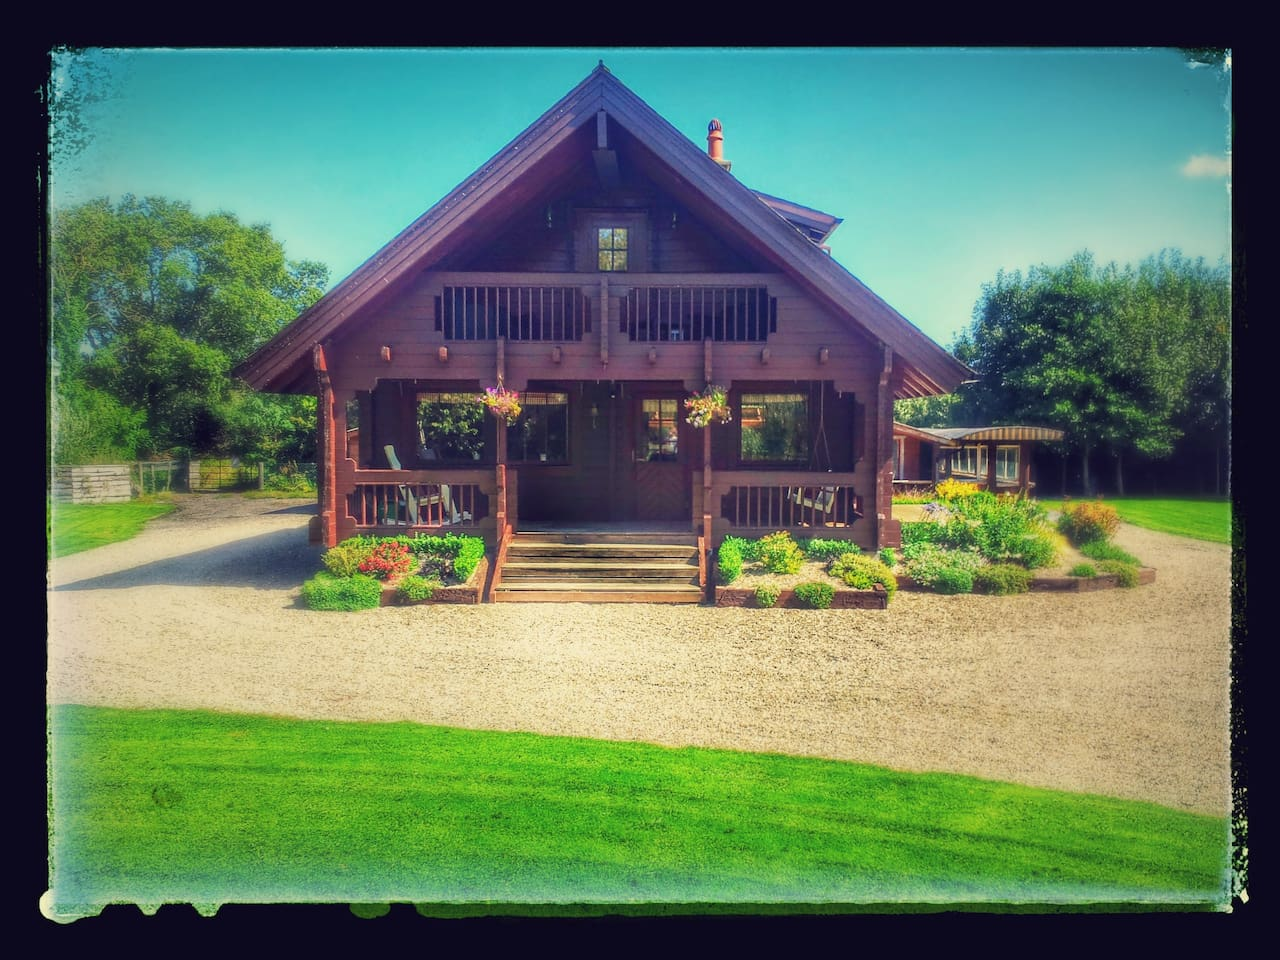 Picturesque Scandinavian Log Cabin with large Woodland Garden